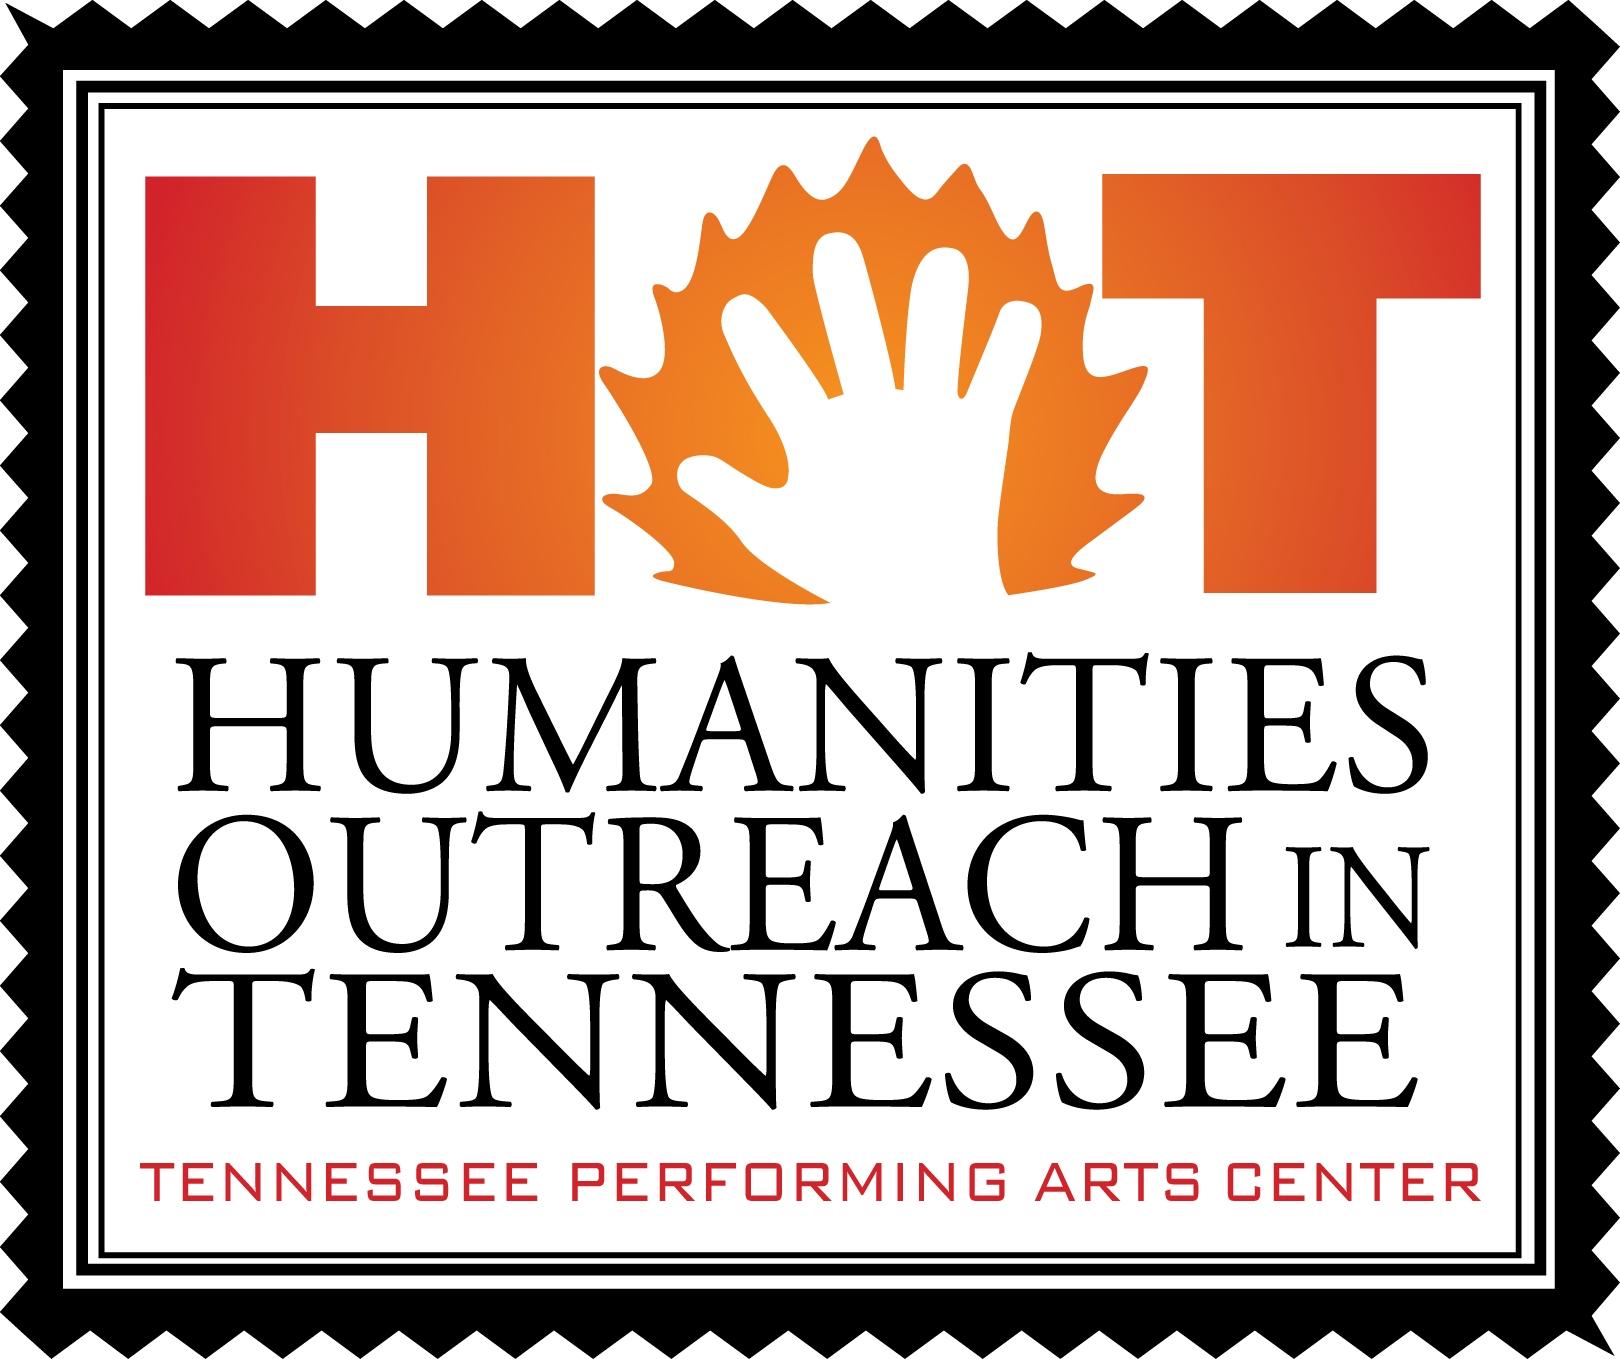 HOT logo 2007 4C